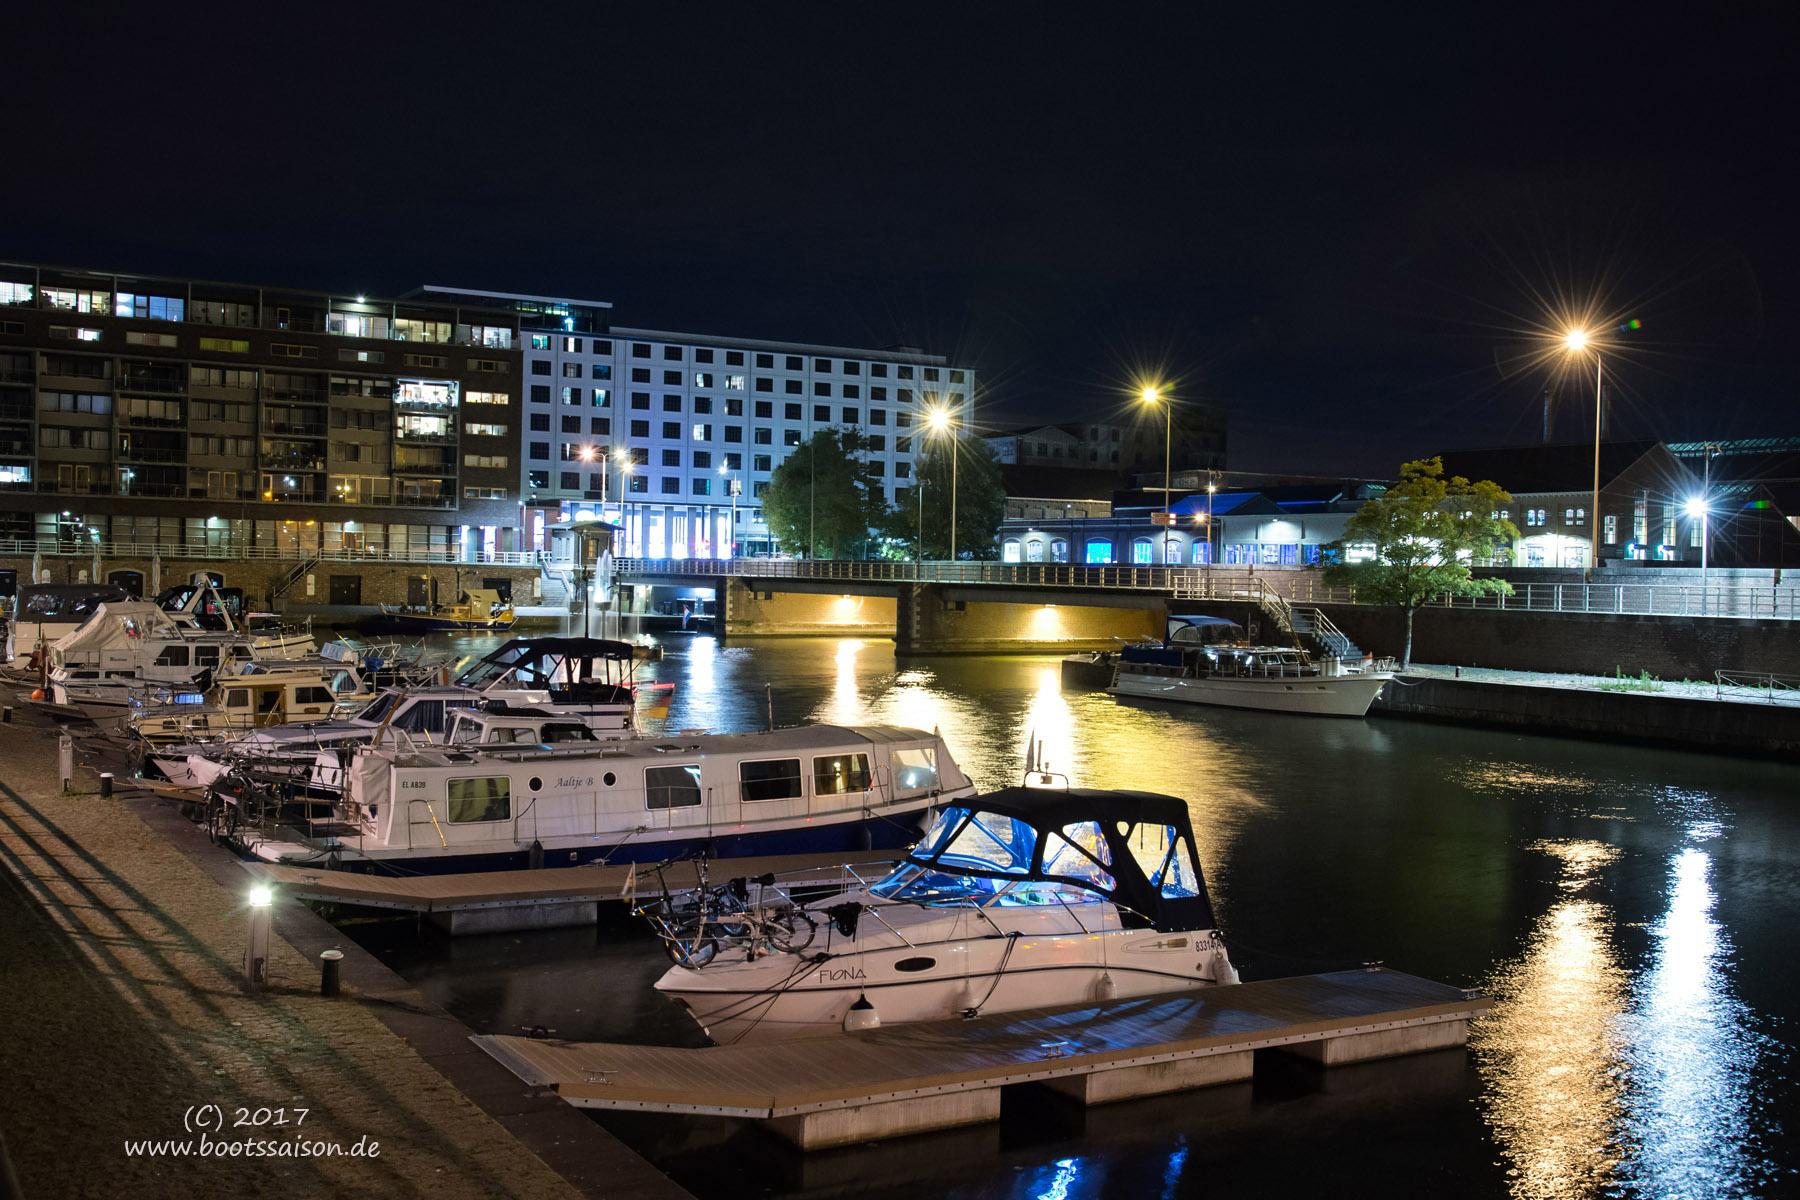 Maastricht Bassin